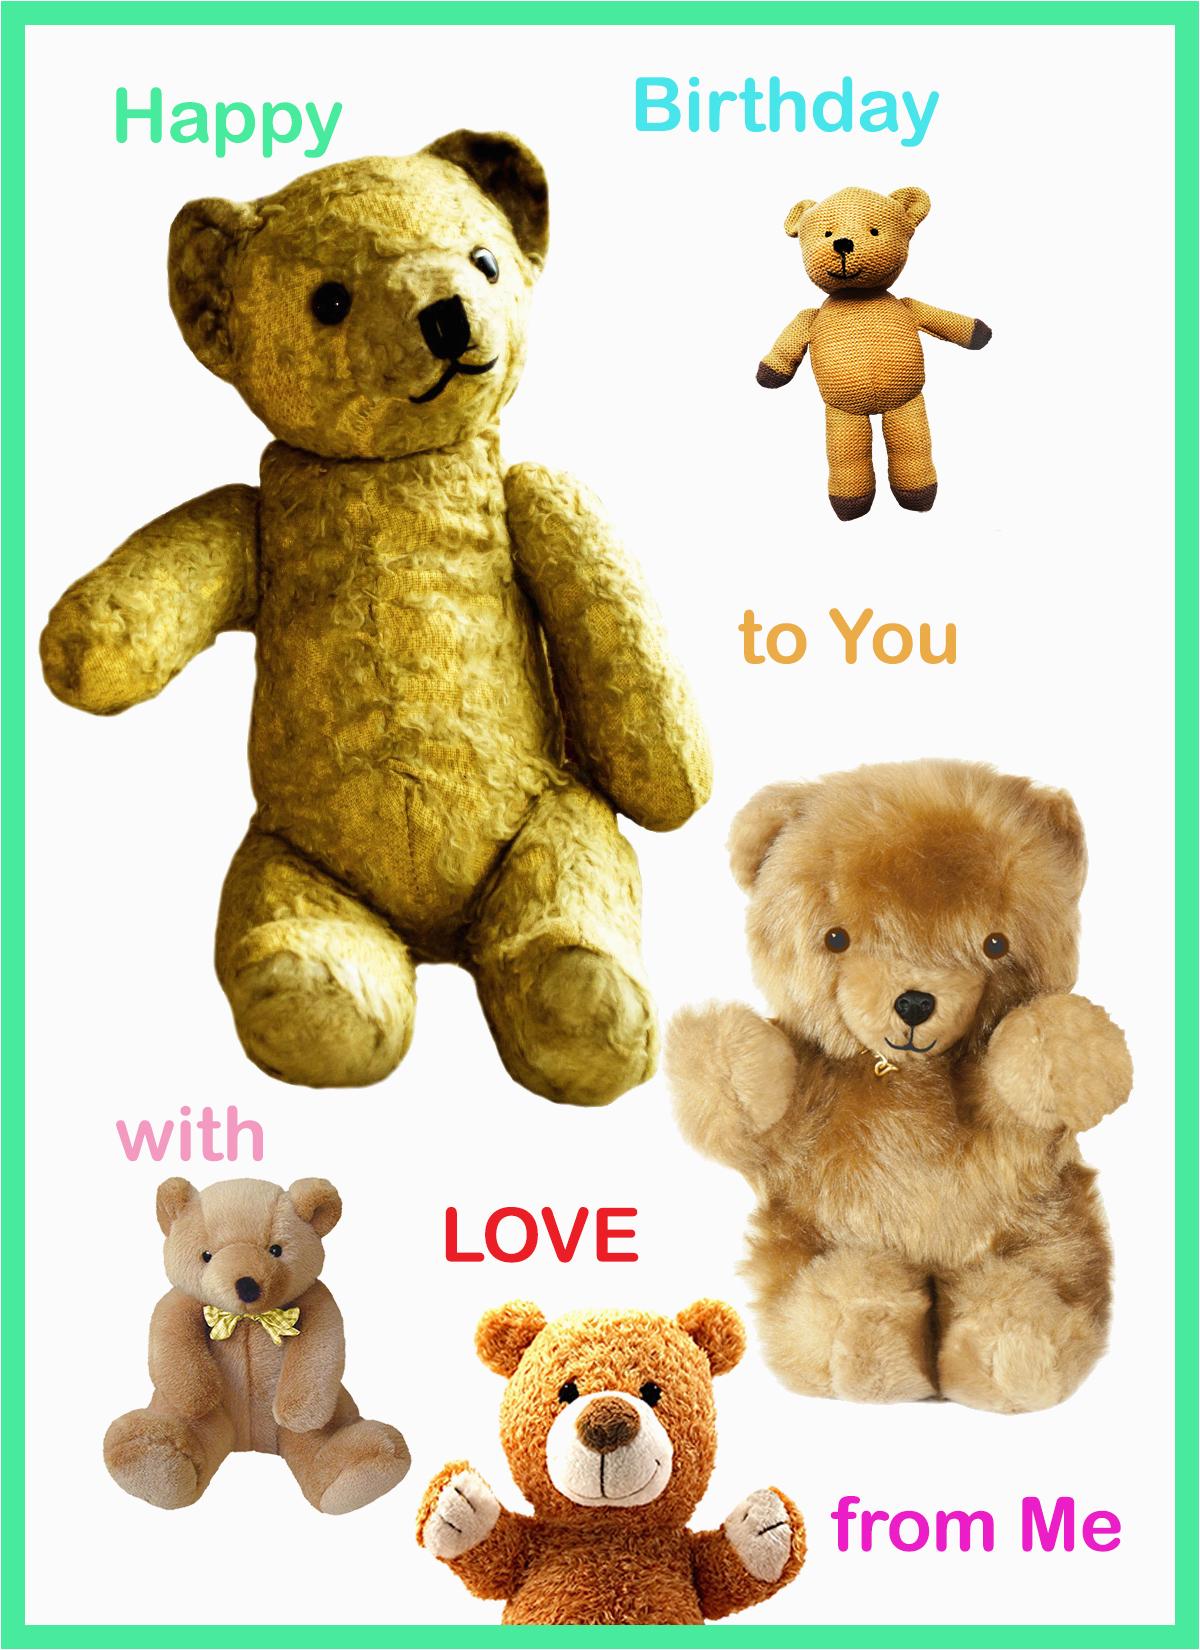 free birthday cards with teddy bears